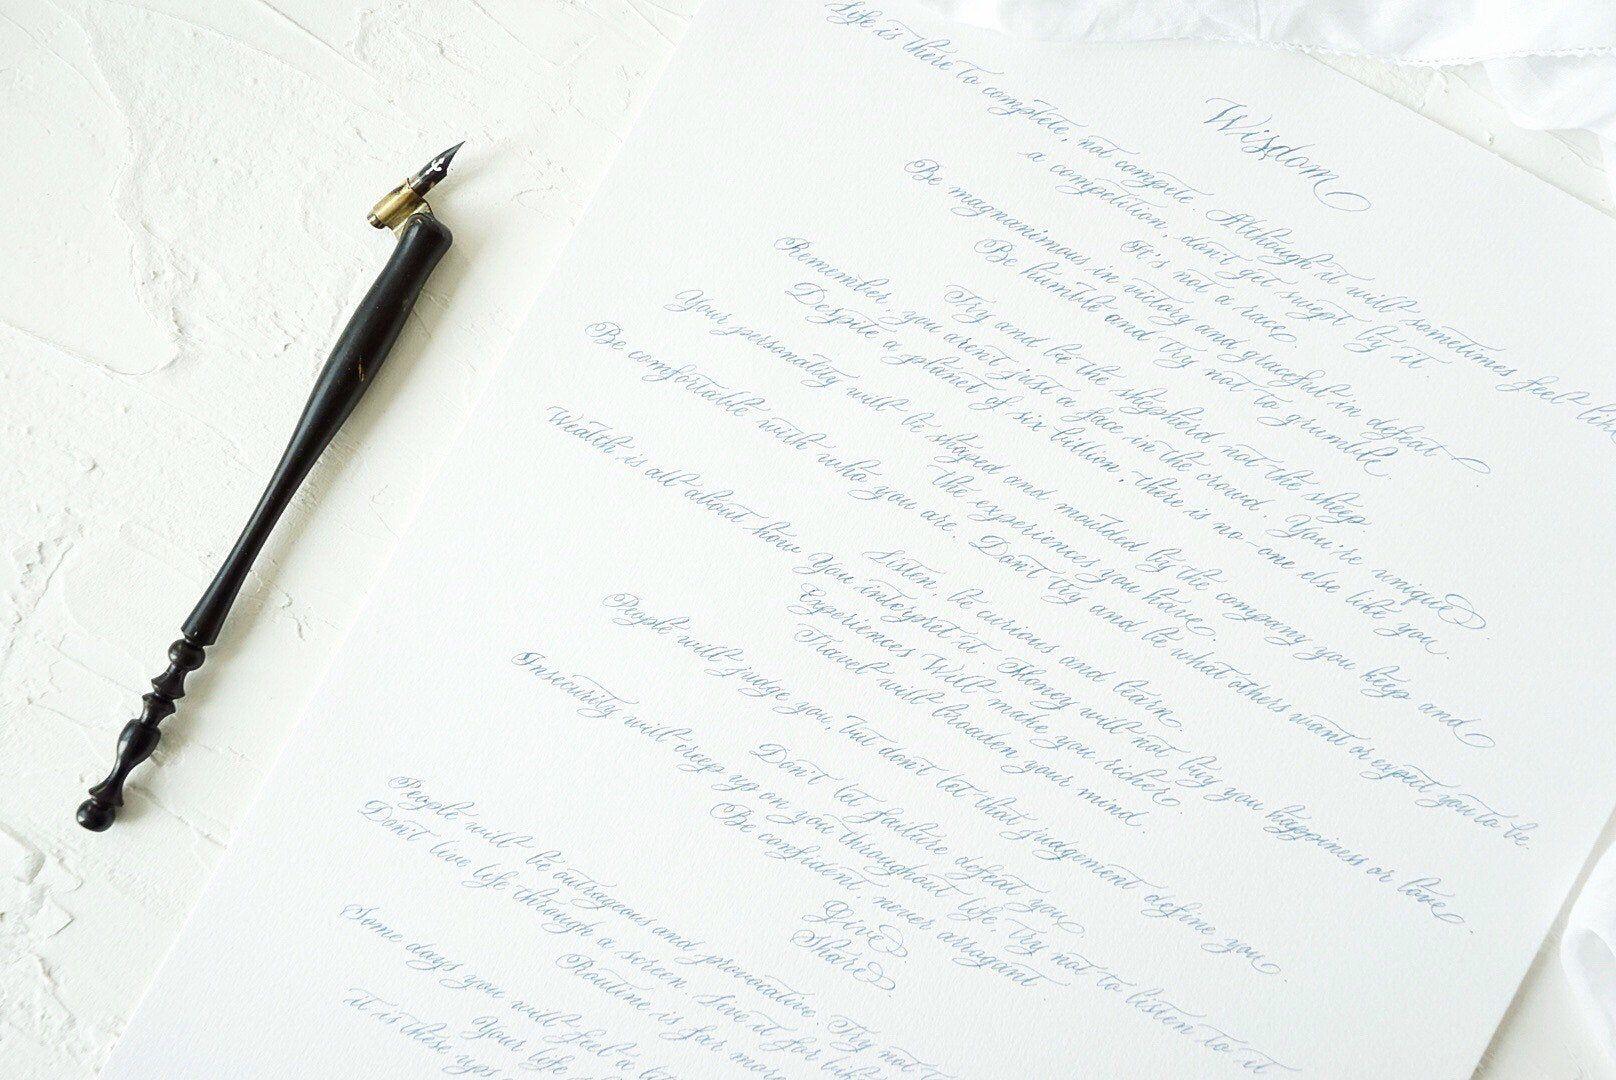 Custom calligraphy for wedding vows, quotes, poems, lyrics